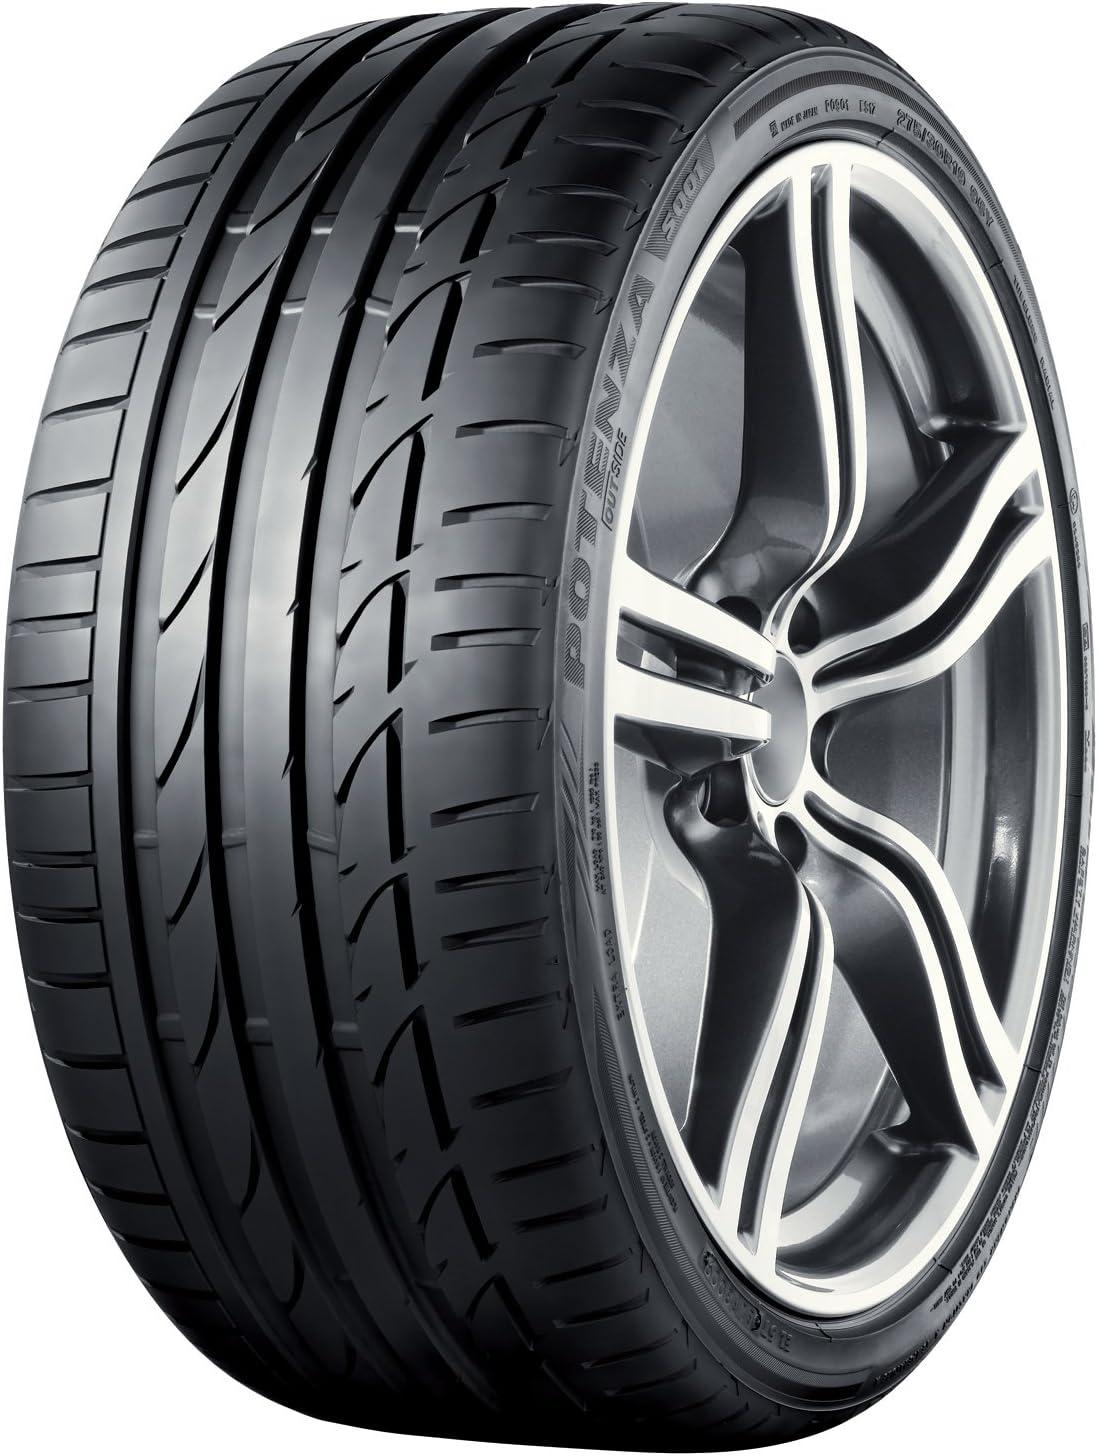 Bridgestone Potenza S 001 I Xl Fsl 215 45r20 95w Sommerreifen Auto